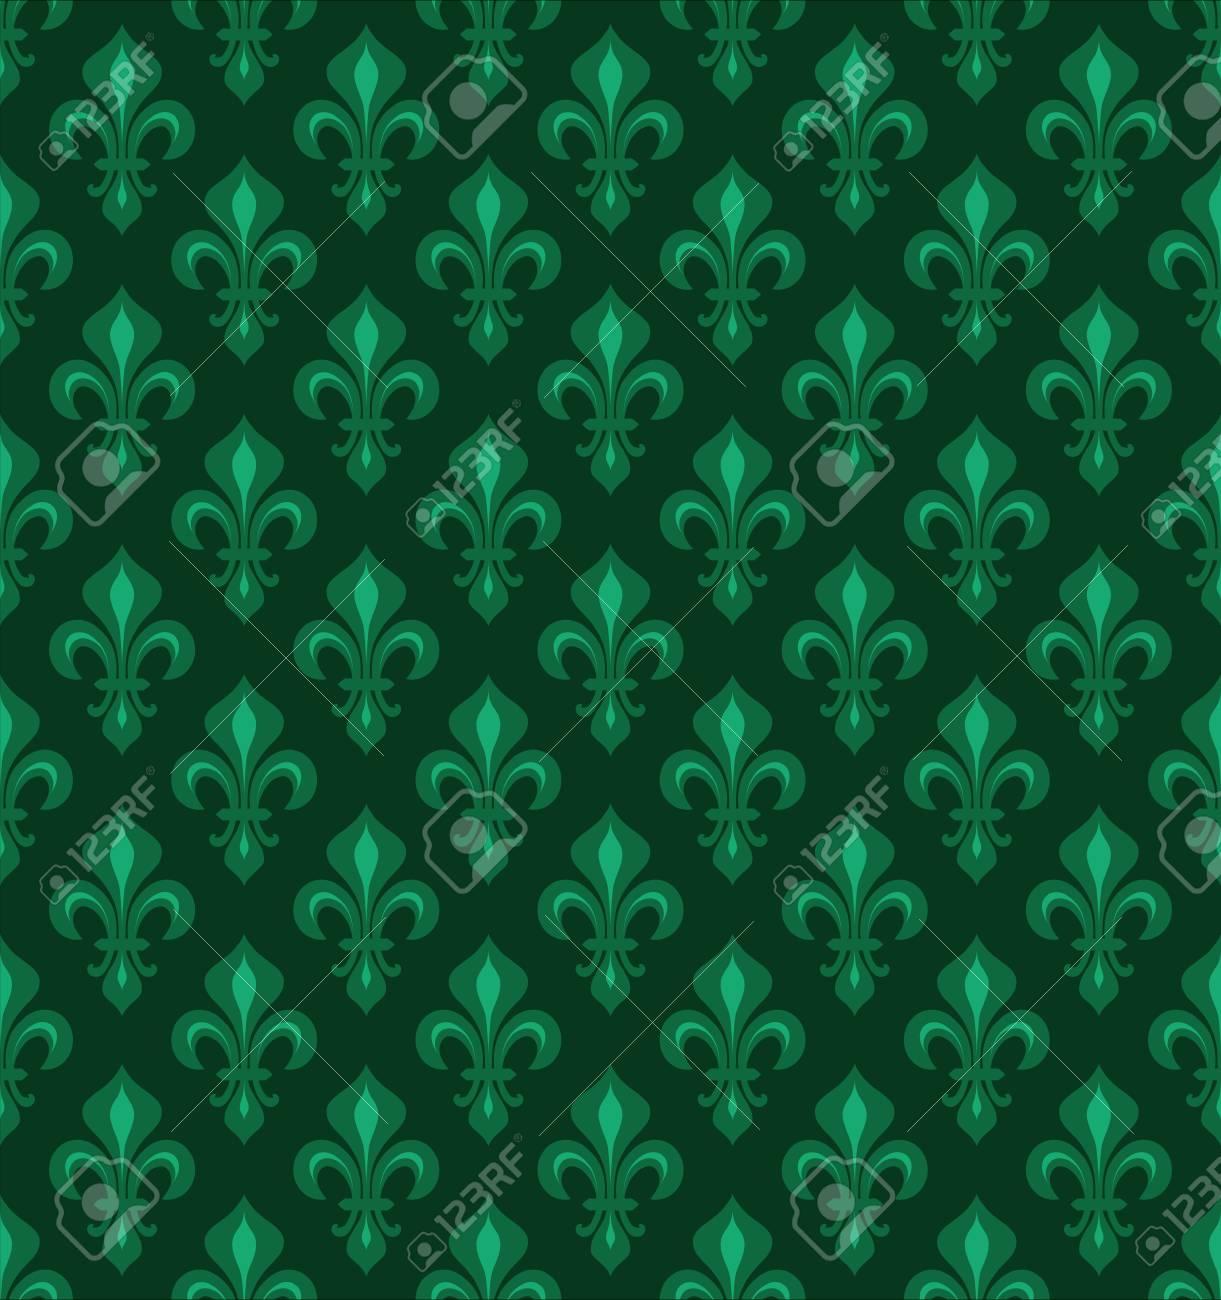 Royal Heraldic Lilies Fleur De Lis â Emerald Green Velvet Seamless Pattern Wallpaper Background